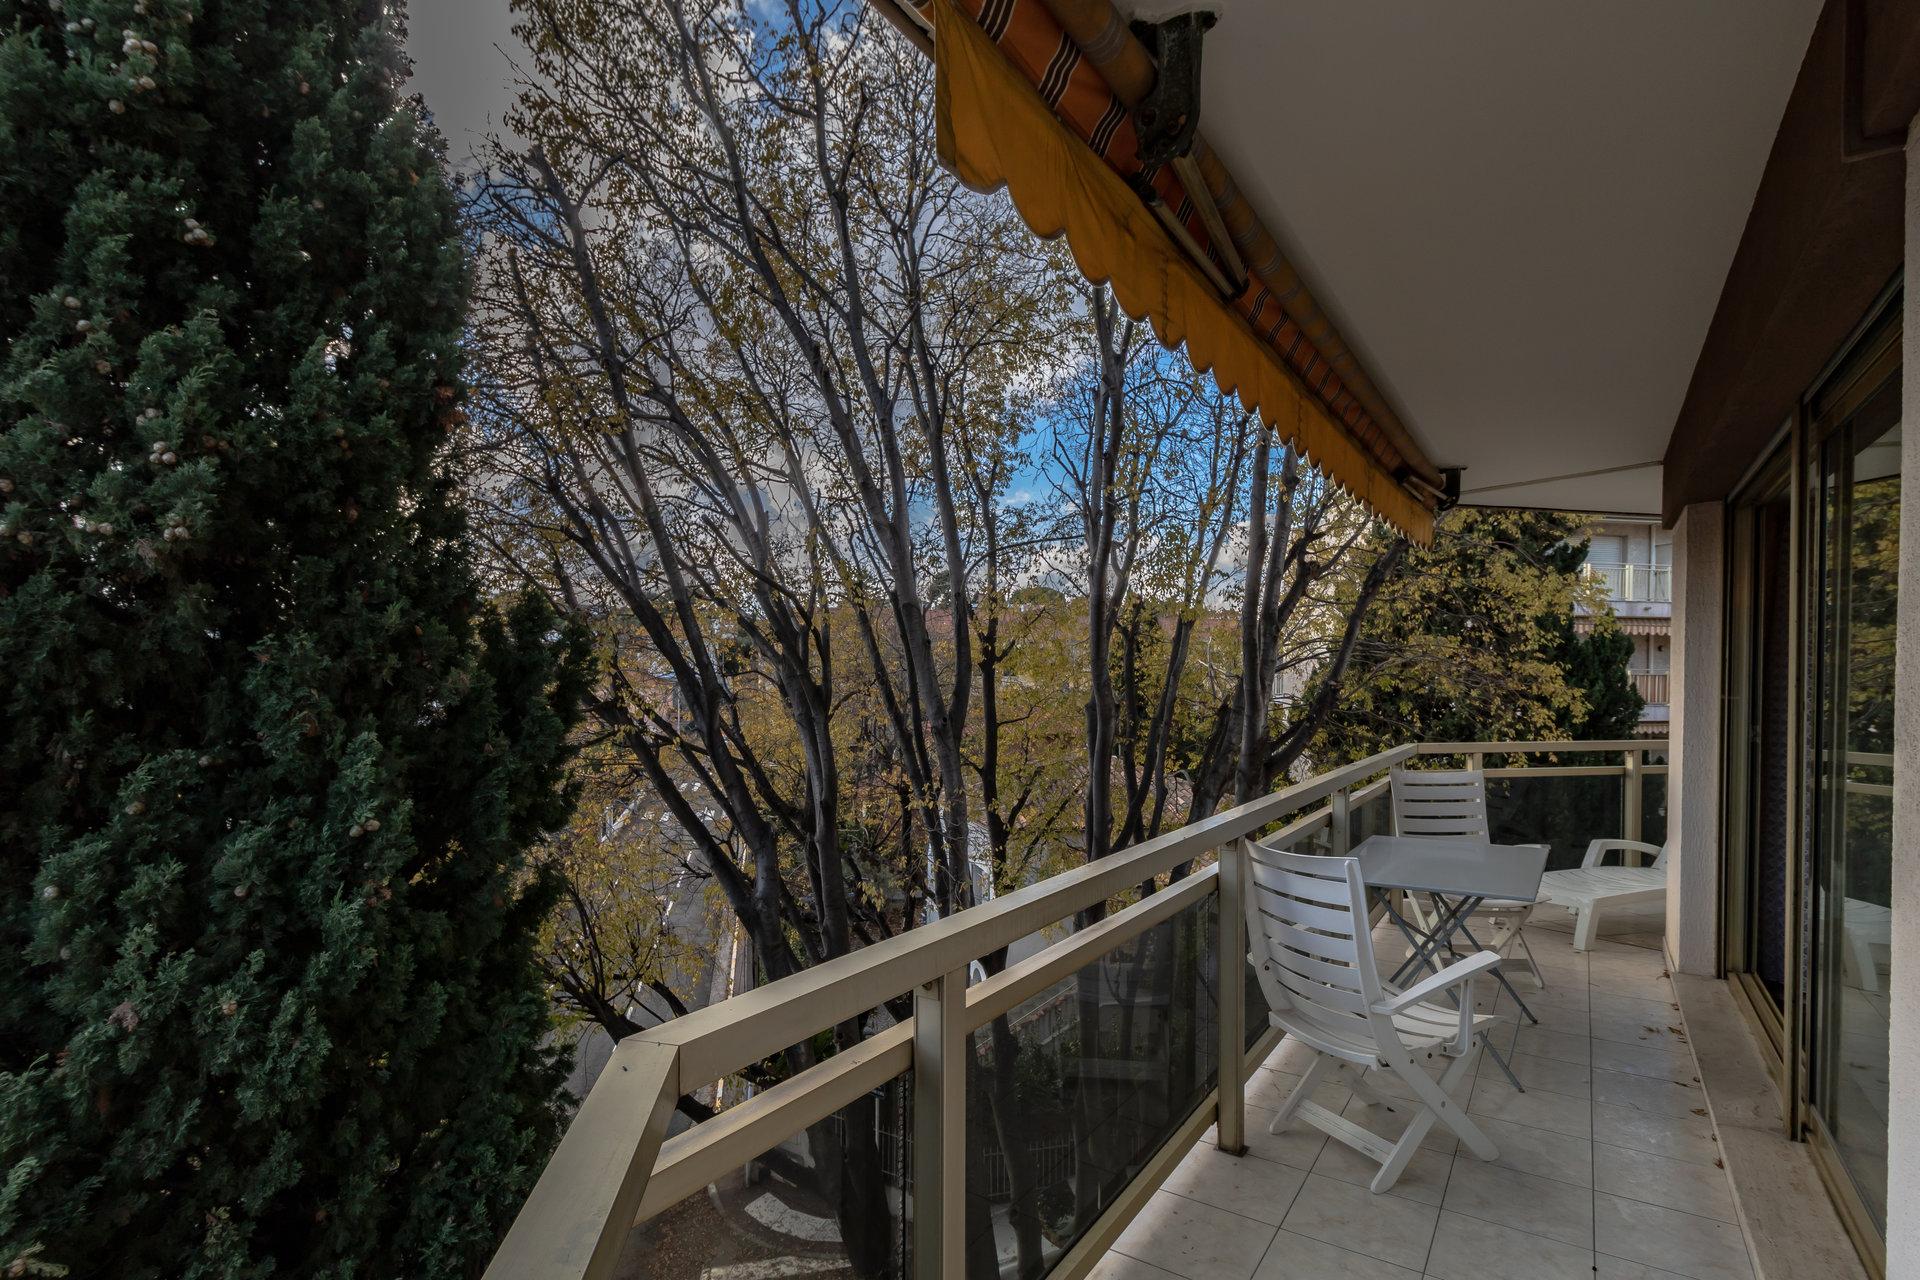 Antibes Ilette, 87sqm with terrace cellar & 2 parkings